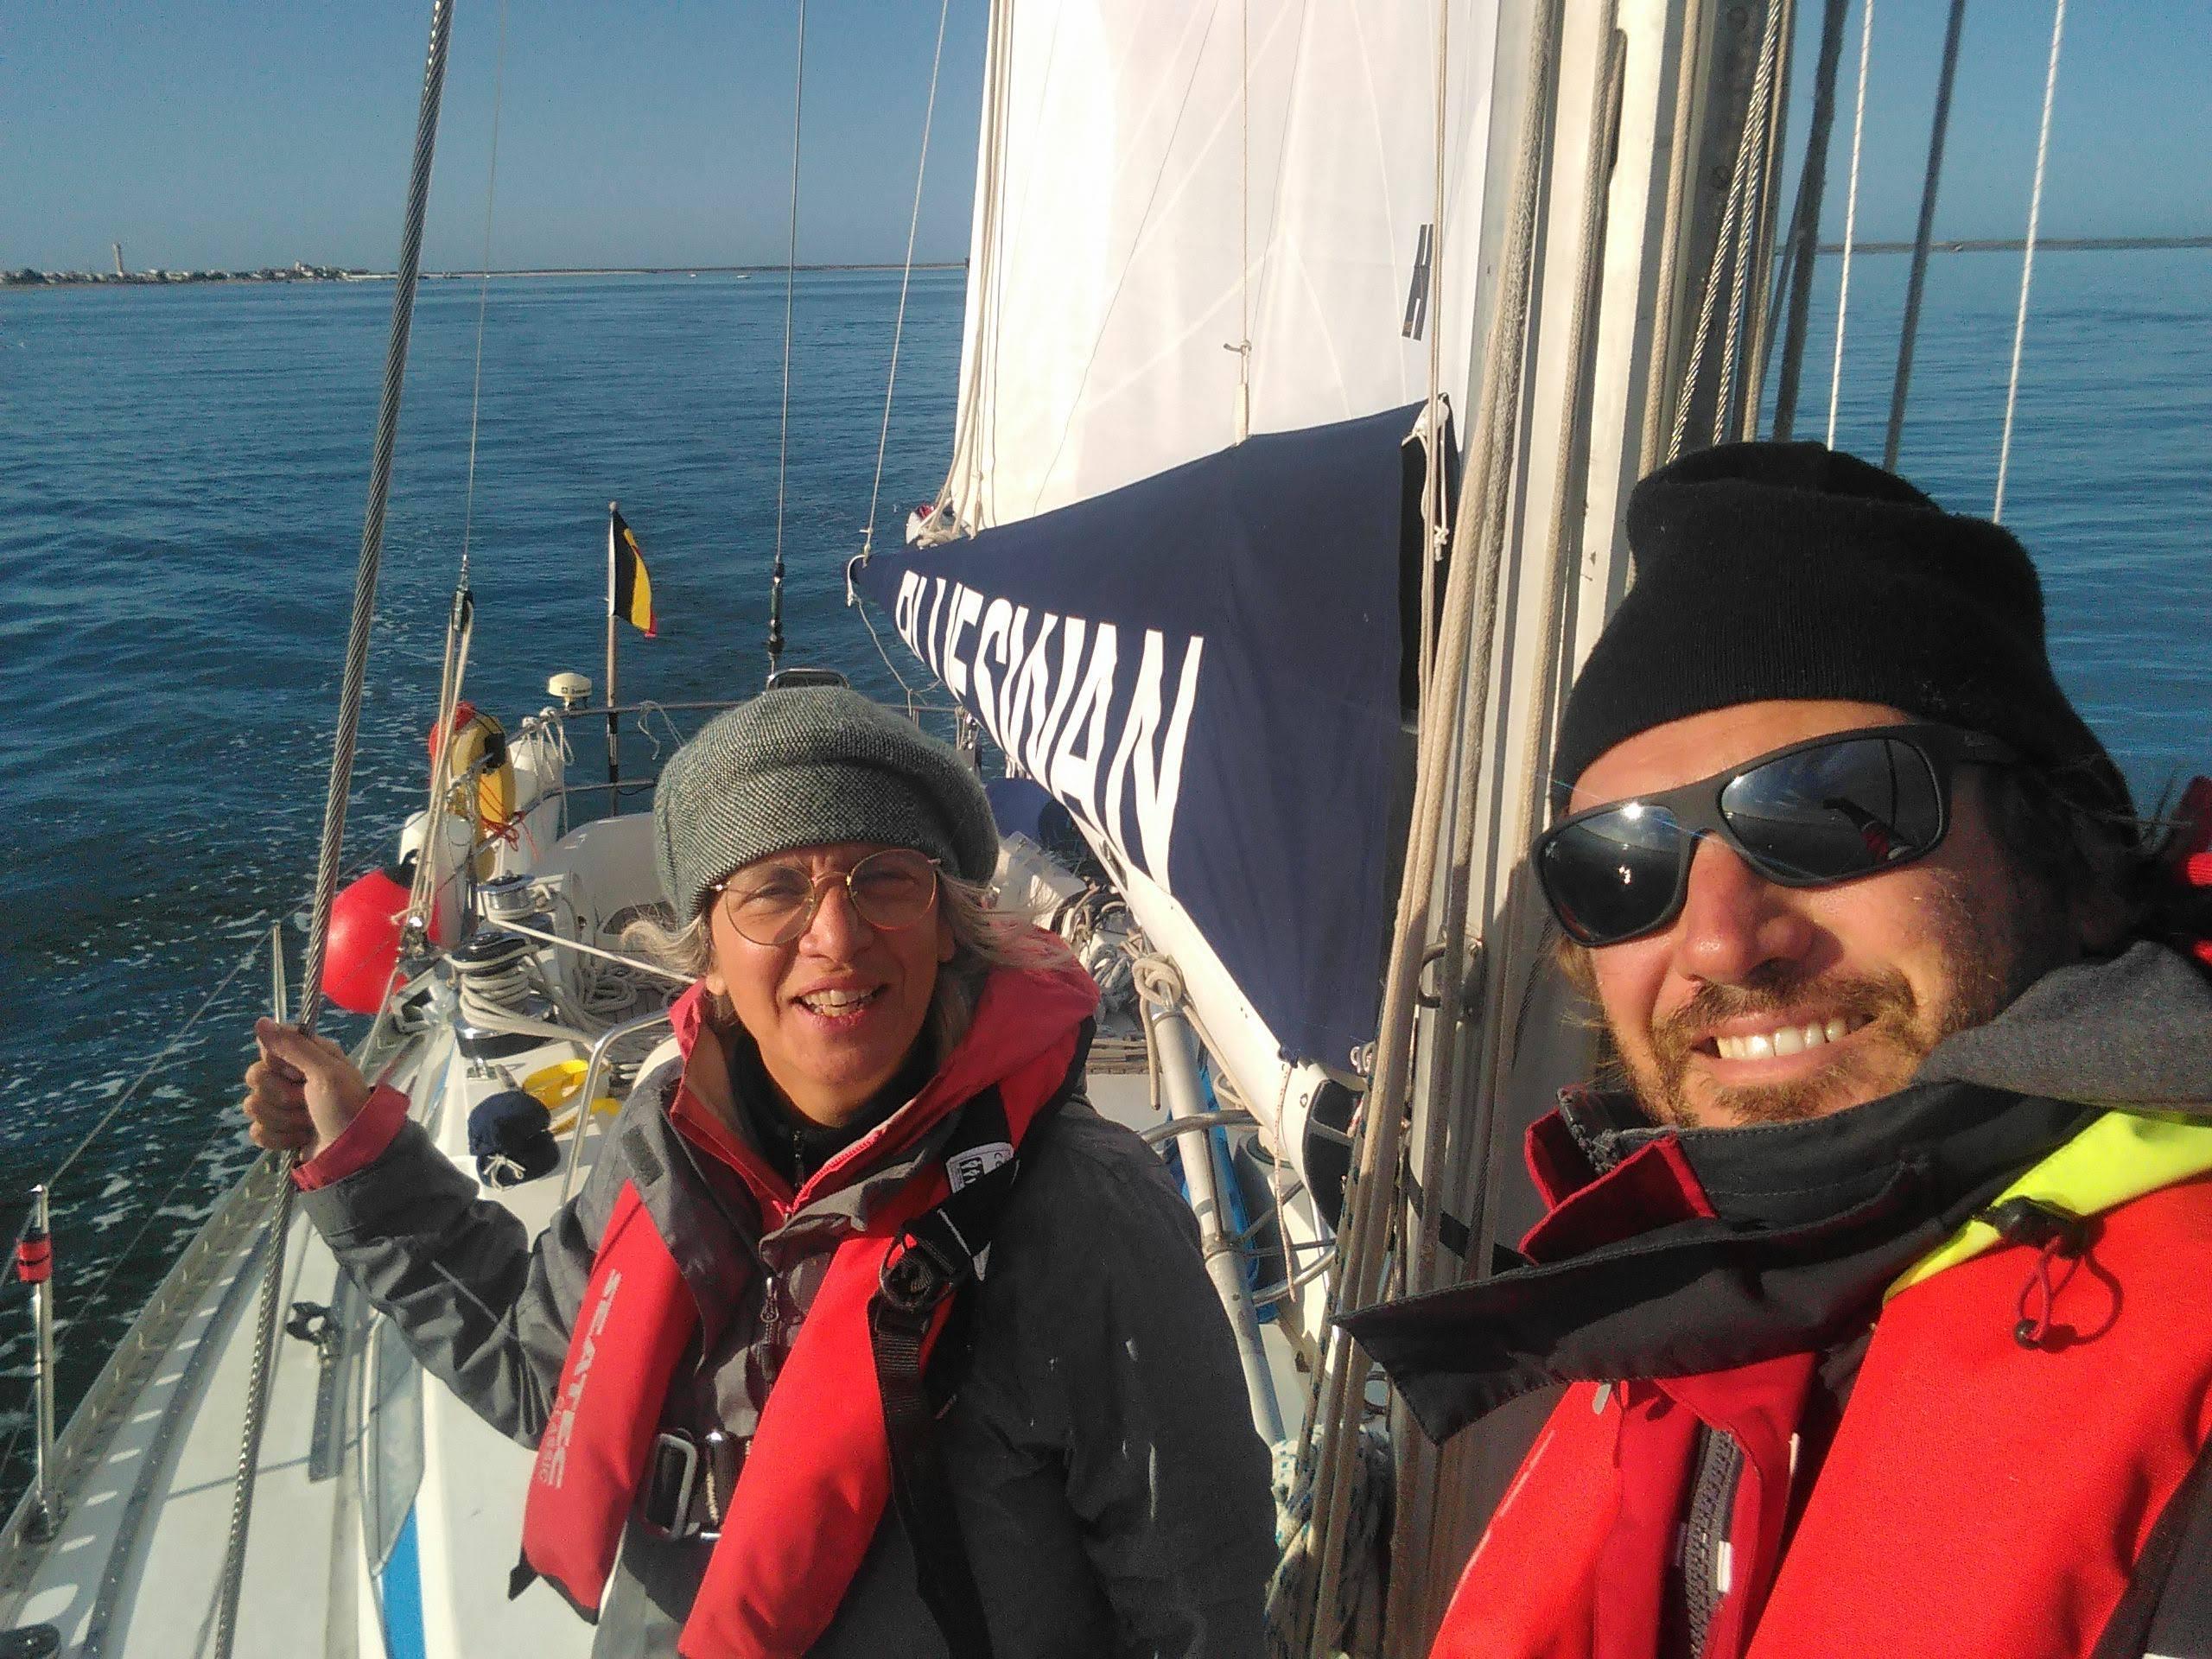 Skipper and crew member onboard